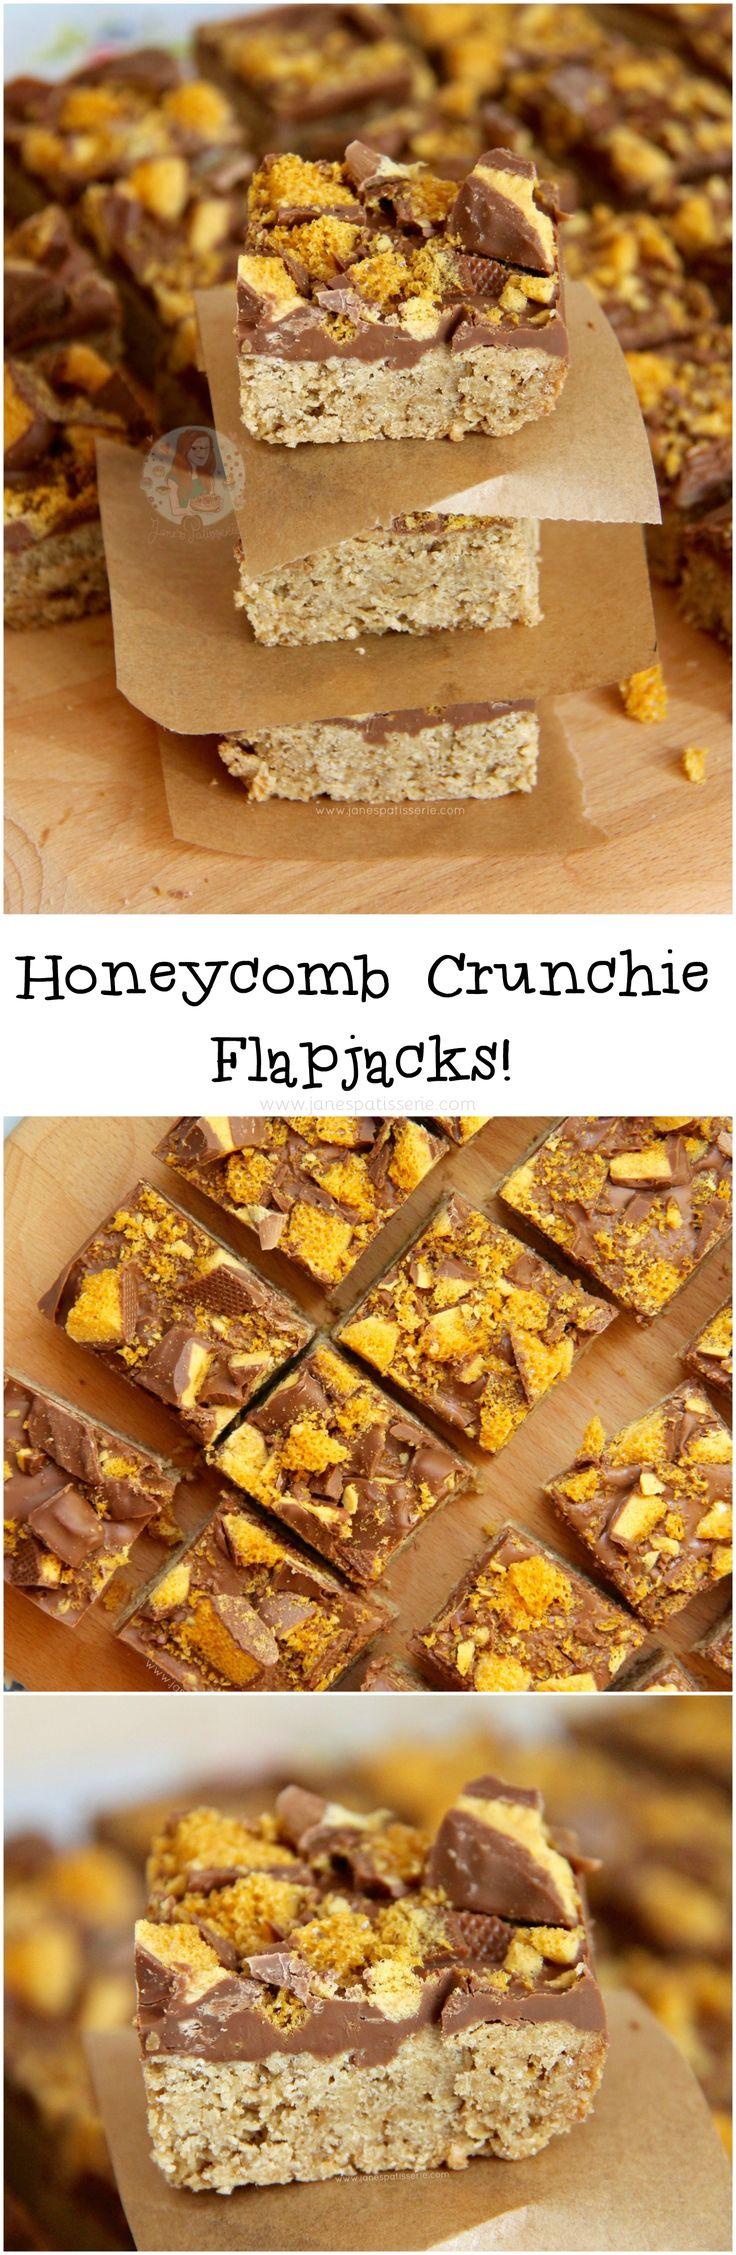 Honeycomb Crunchie Flapjacks! ❤️ A classic traybake, with a sweet chocolatey twist – Honeycomb Flapjacks!